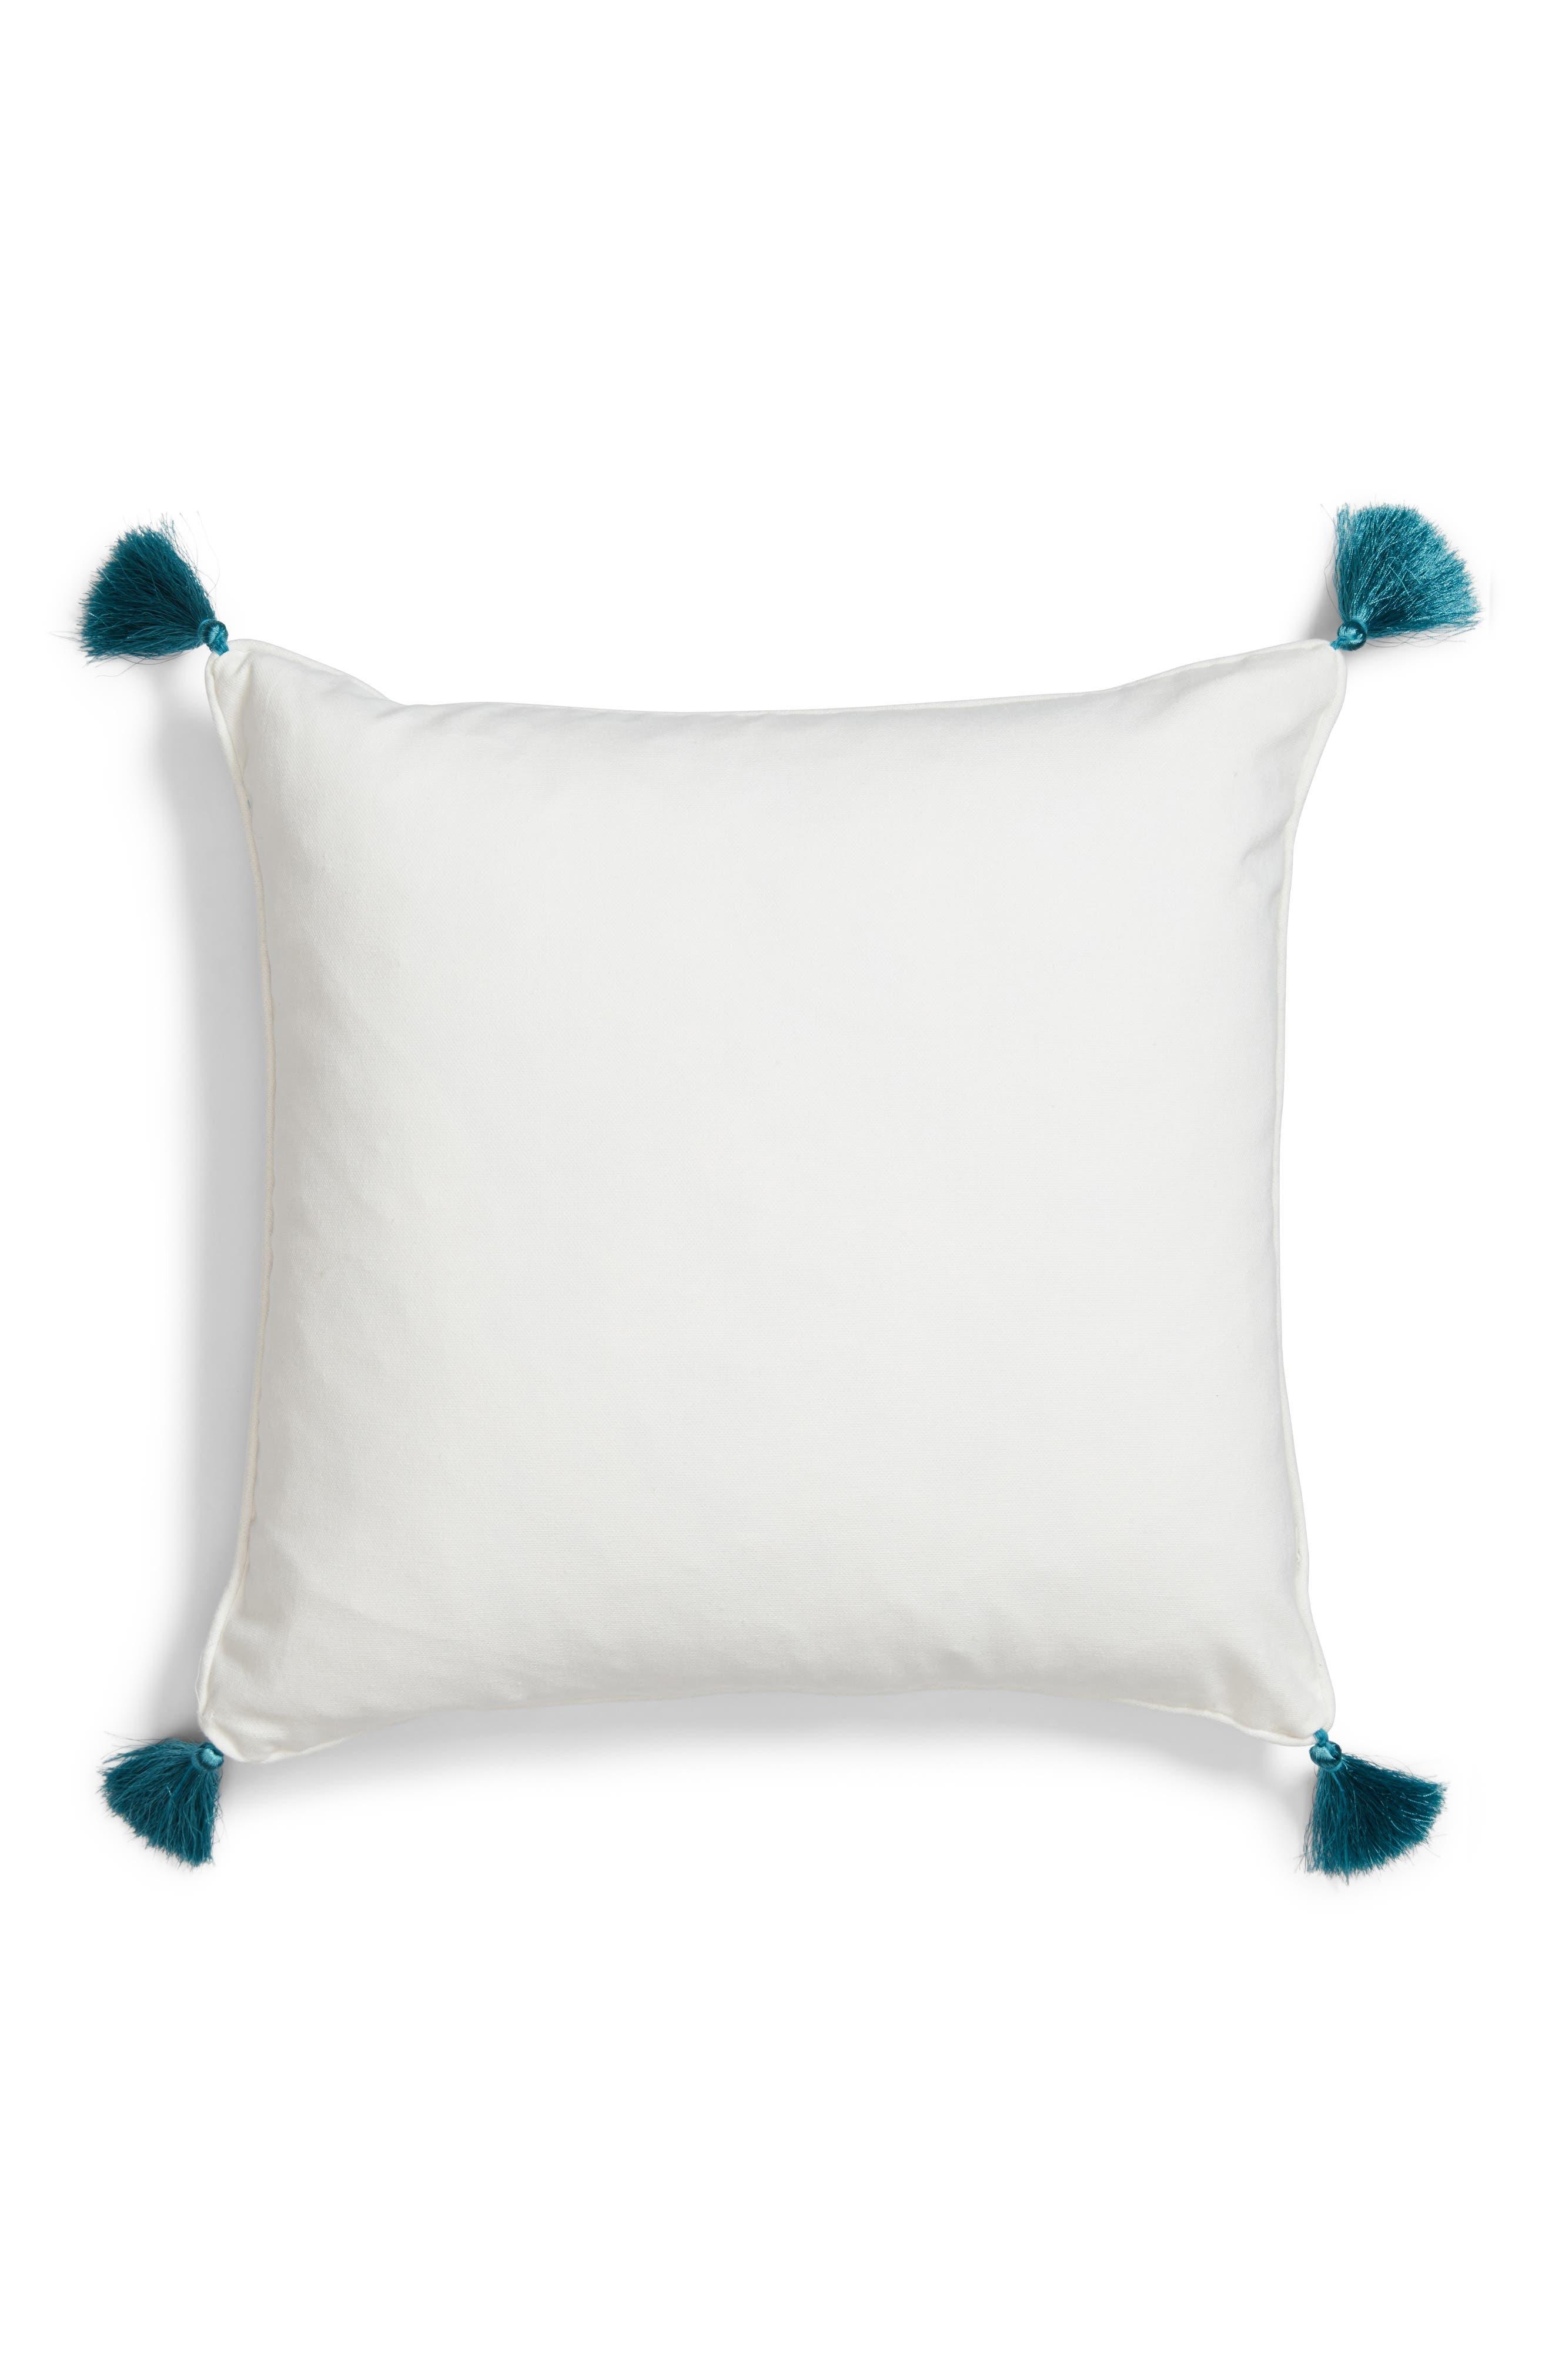 Luca Accent Pillow,                             Alternate thumbnail 3, color,                             Green